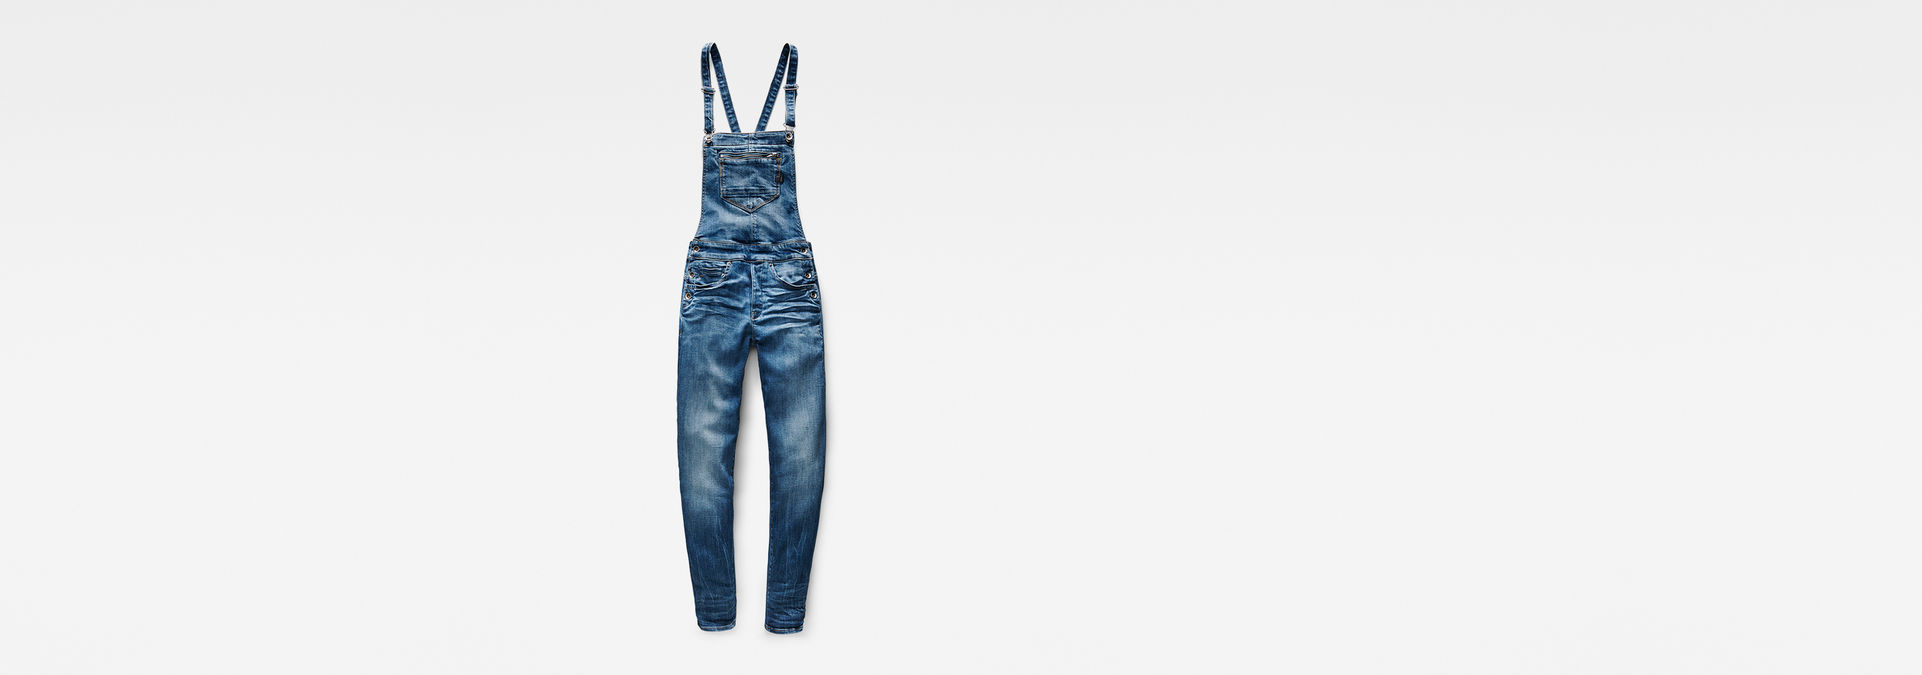 96dd6186126 ... G-Star RAW® Midge Slim Overalls Medium blue flat front ...